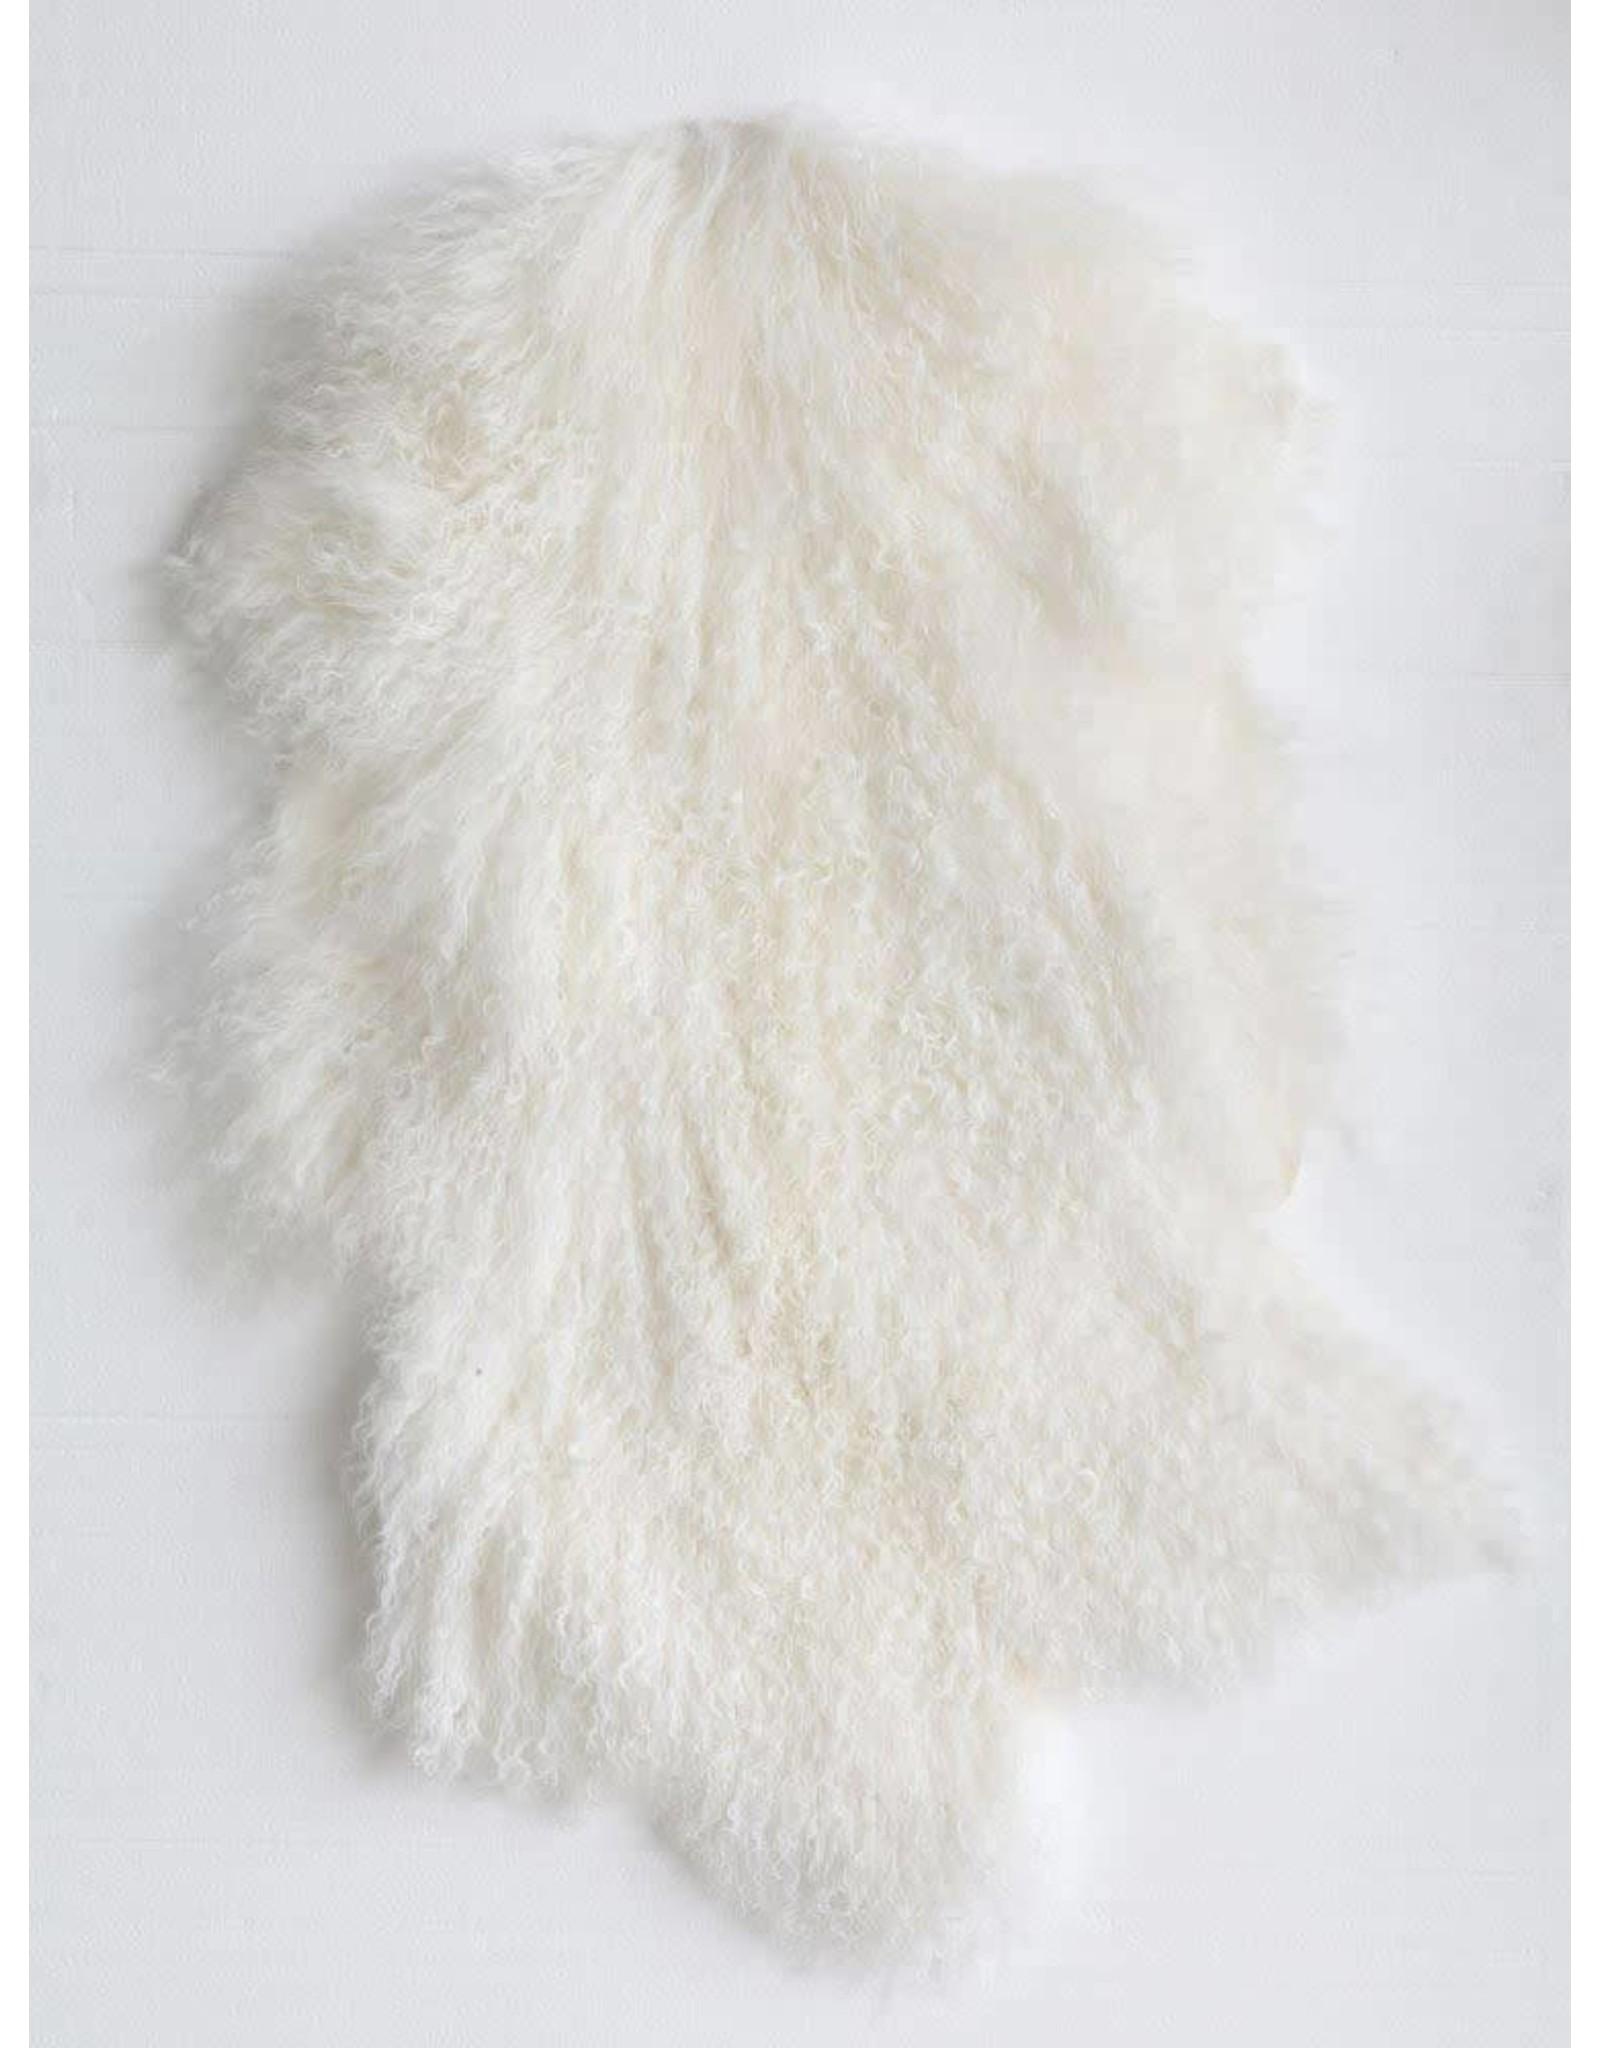 Mongolian Fur Rug 2' x 3'